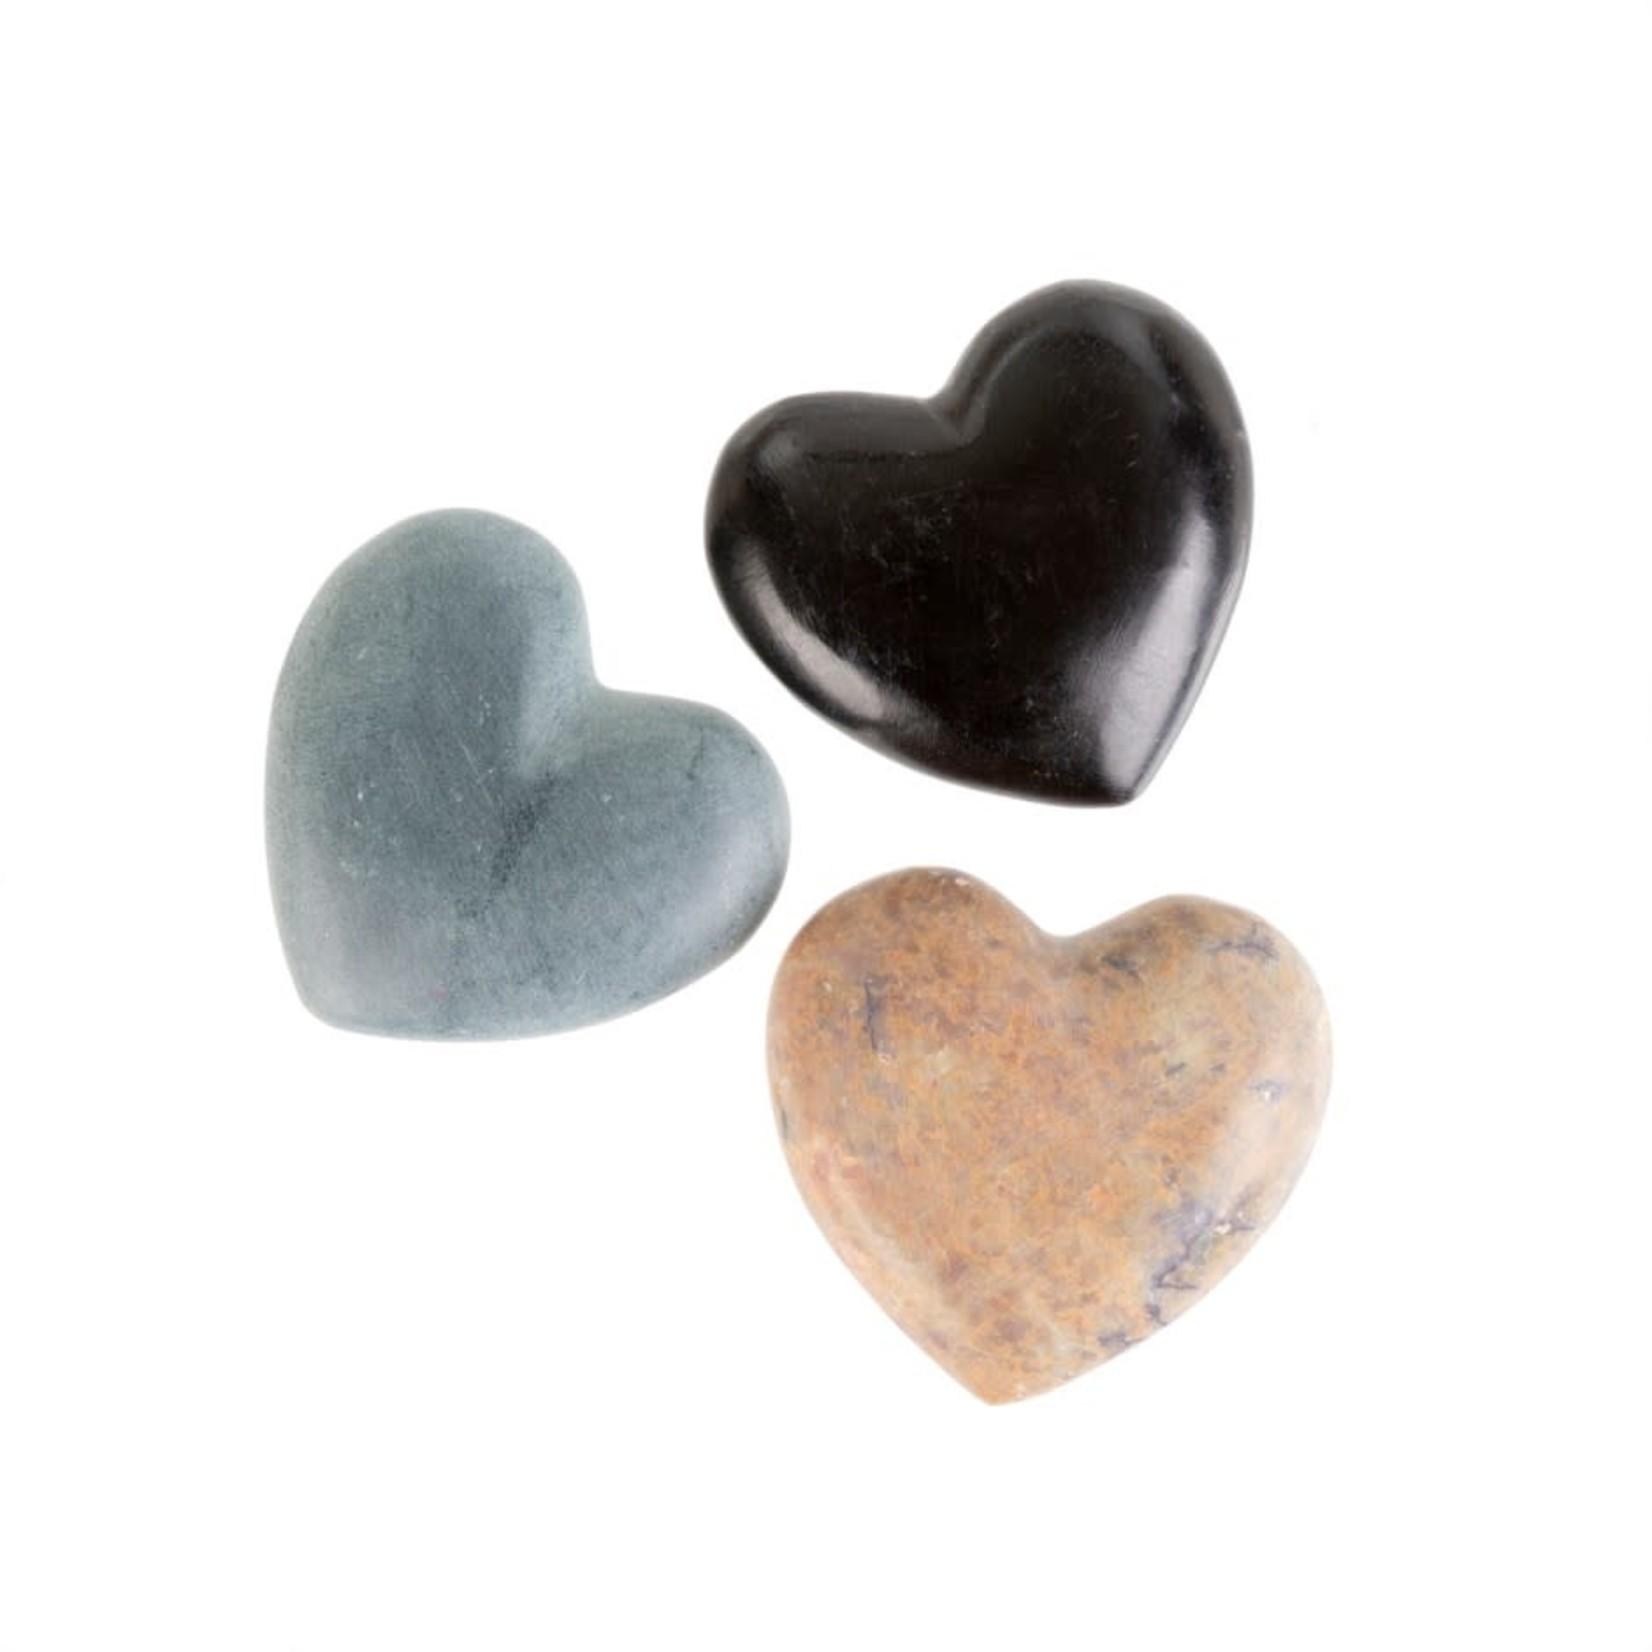 Mini Soapstone Hearts